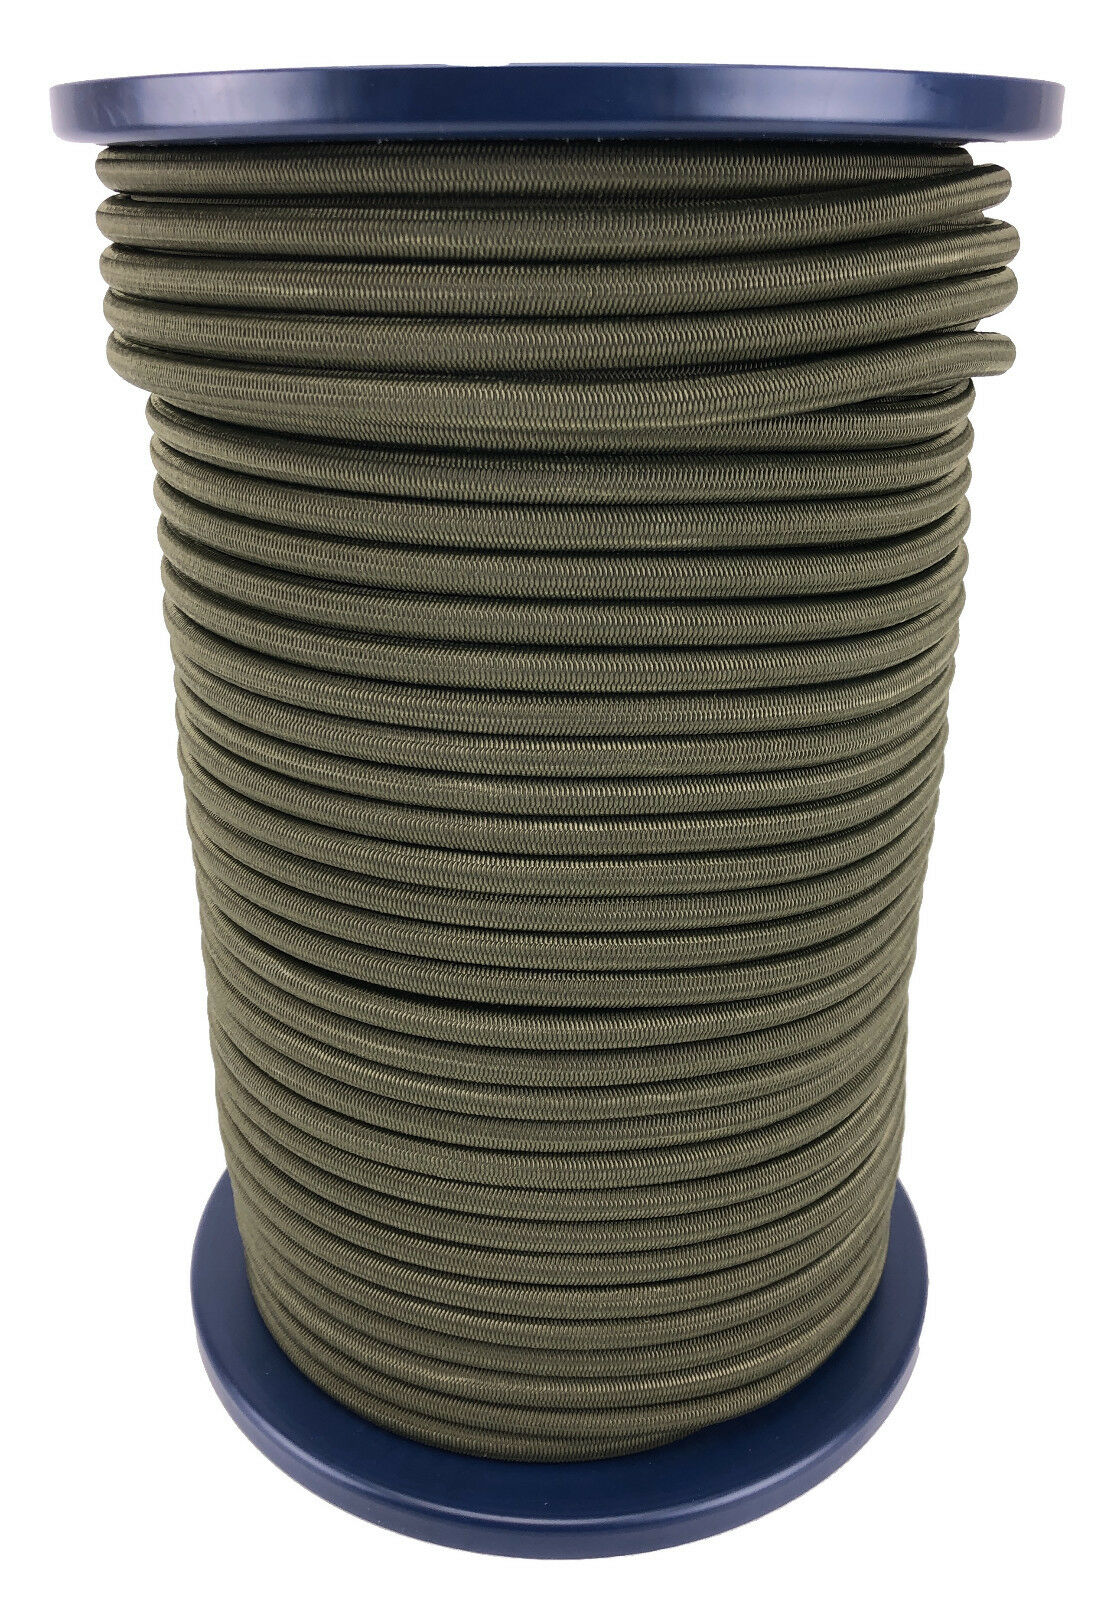 12 mm verde Militare Elastico Bungee Corda. Corda Elastica Fissaggio x 35 Metri